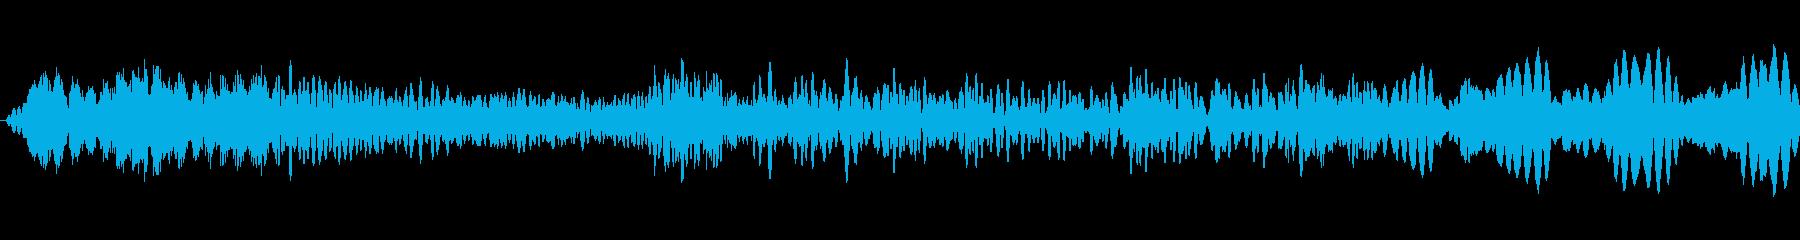 SciFi EC01_92_2の再生済みの波形